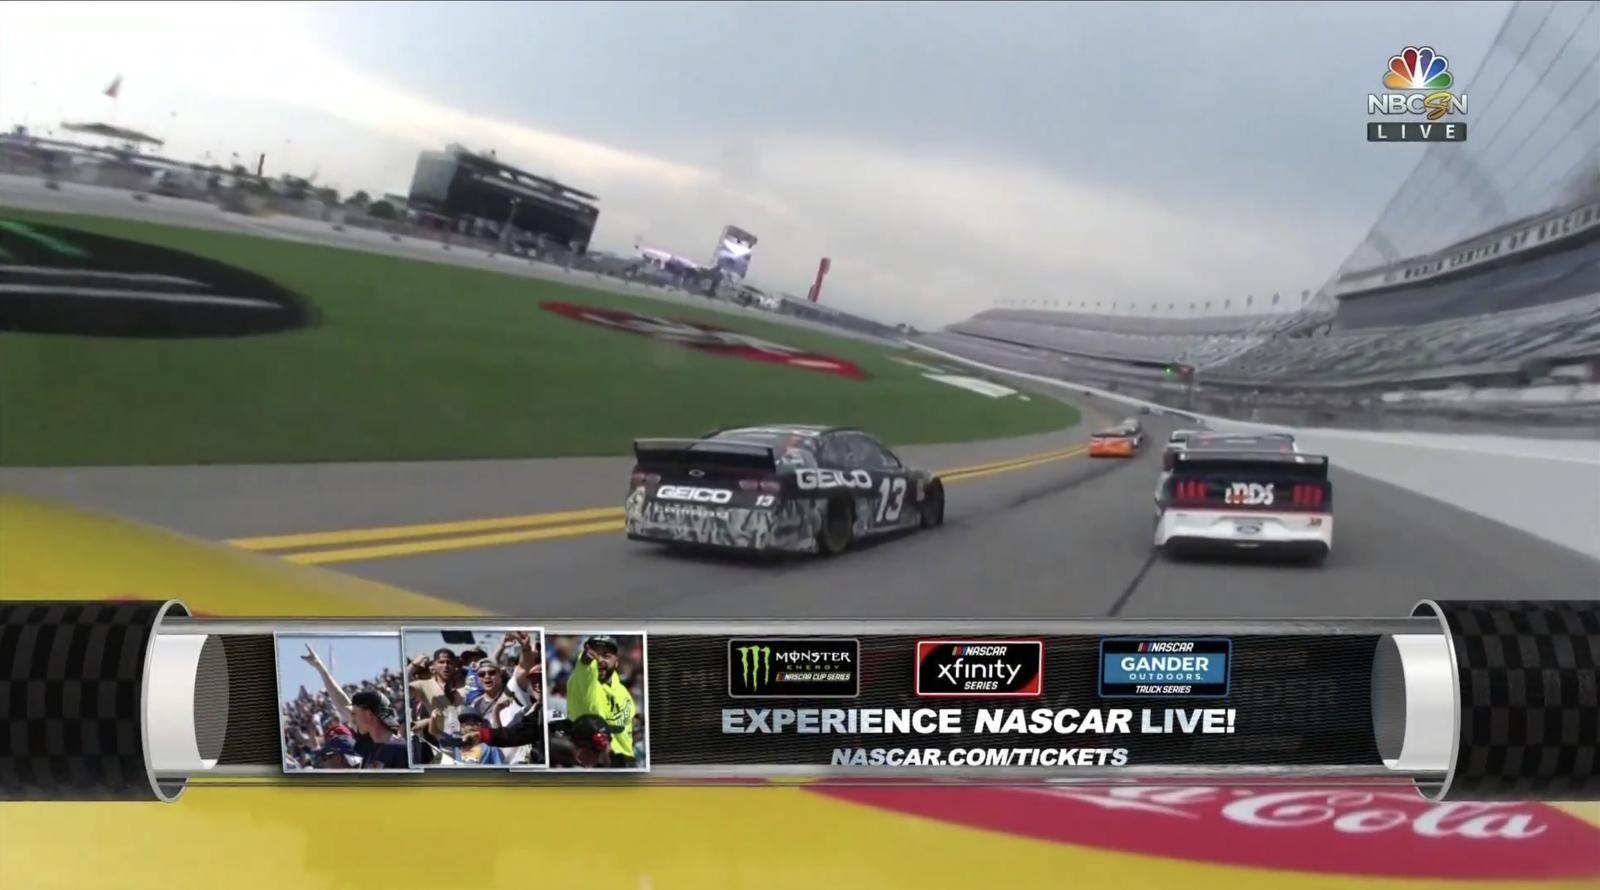 NCS_NBC-Sports_NASCAR-Design_0029